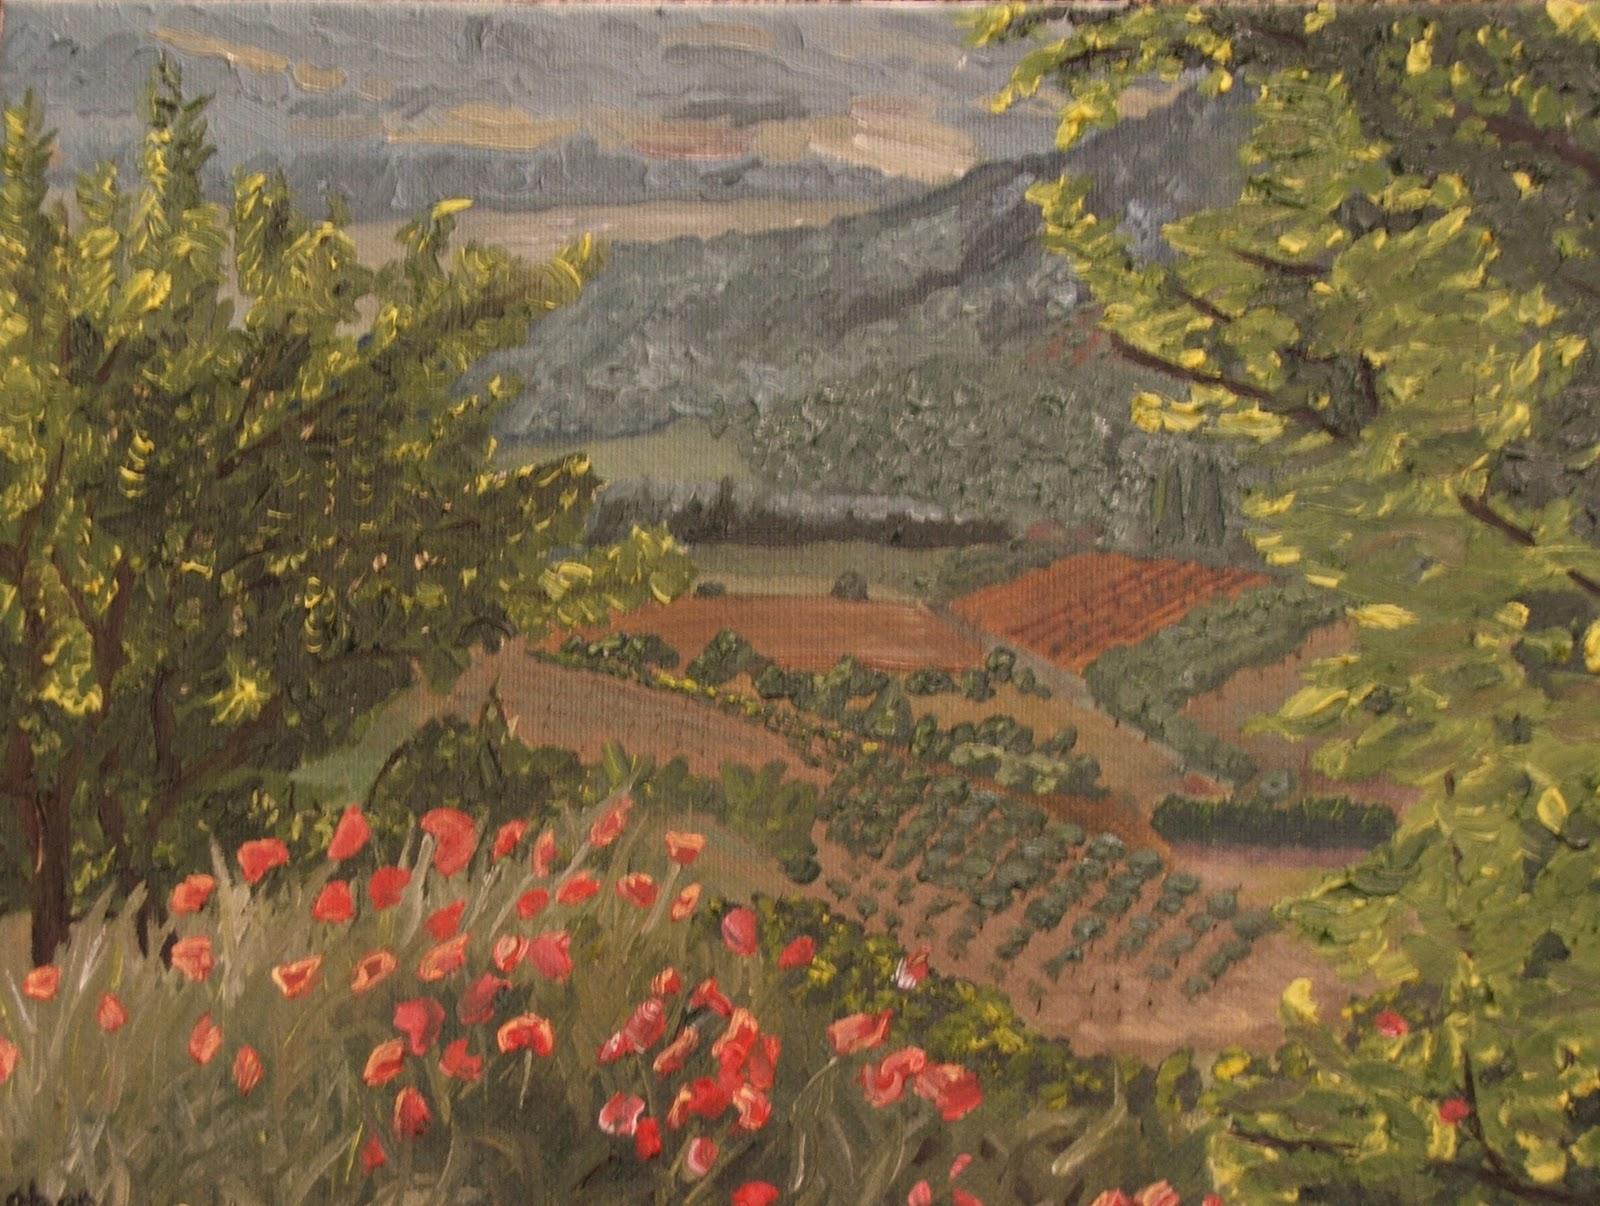 impressionism art landscape - photo #45